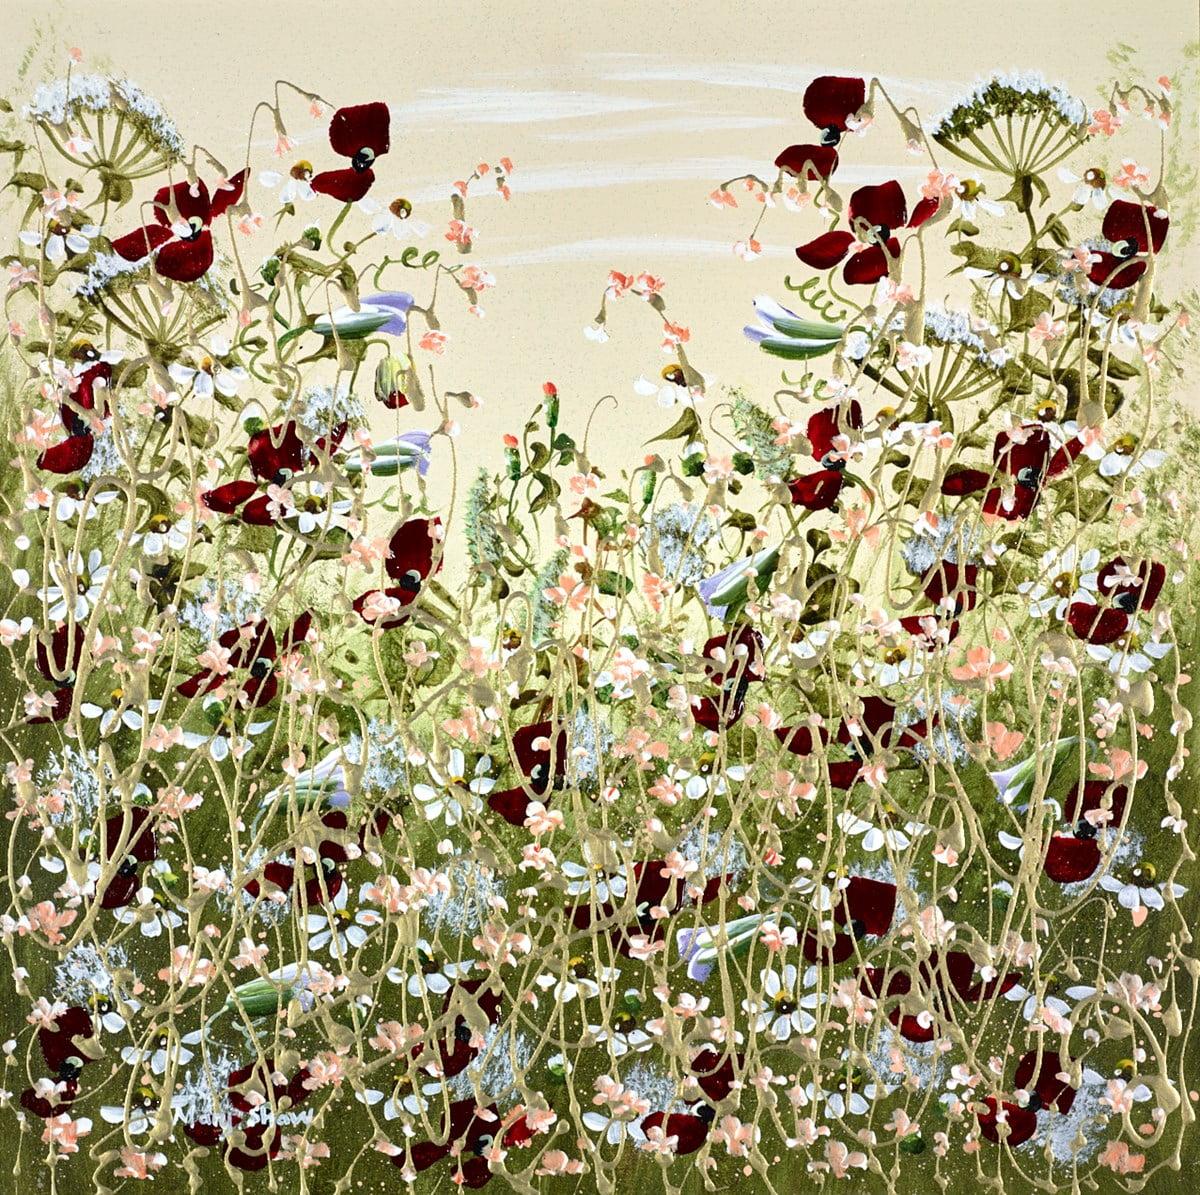 Red Petals VI ~ Mary Shaw